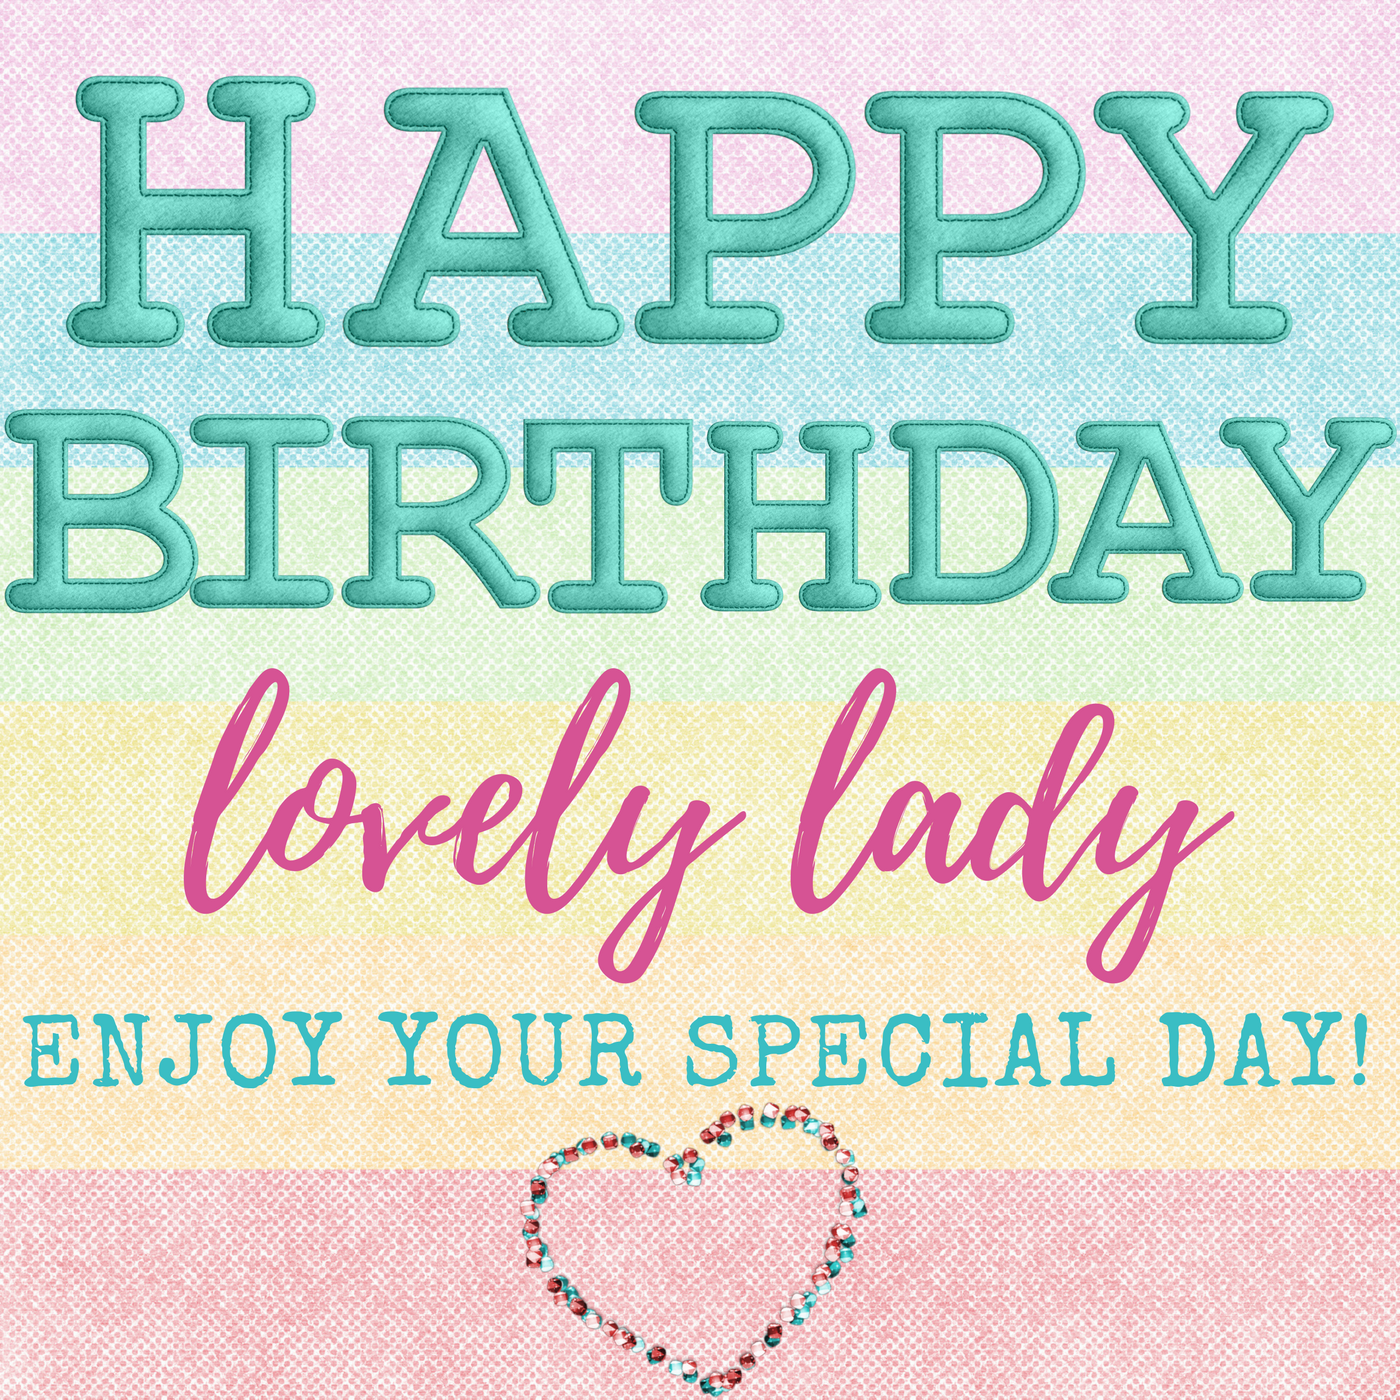 Happy Birthday Beautiful Lady Images